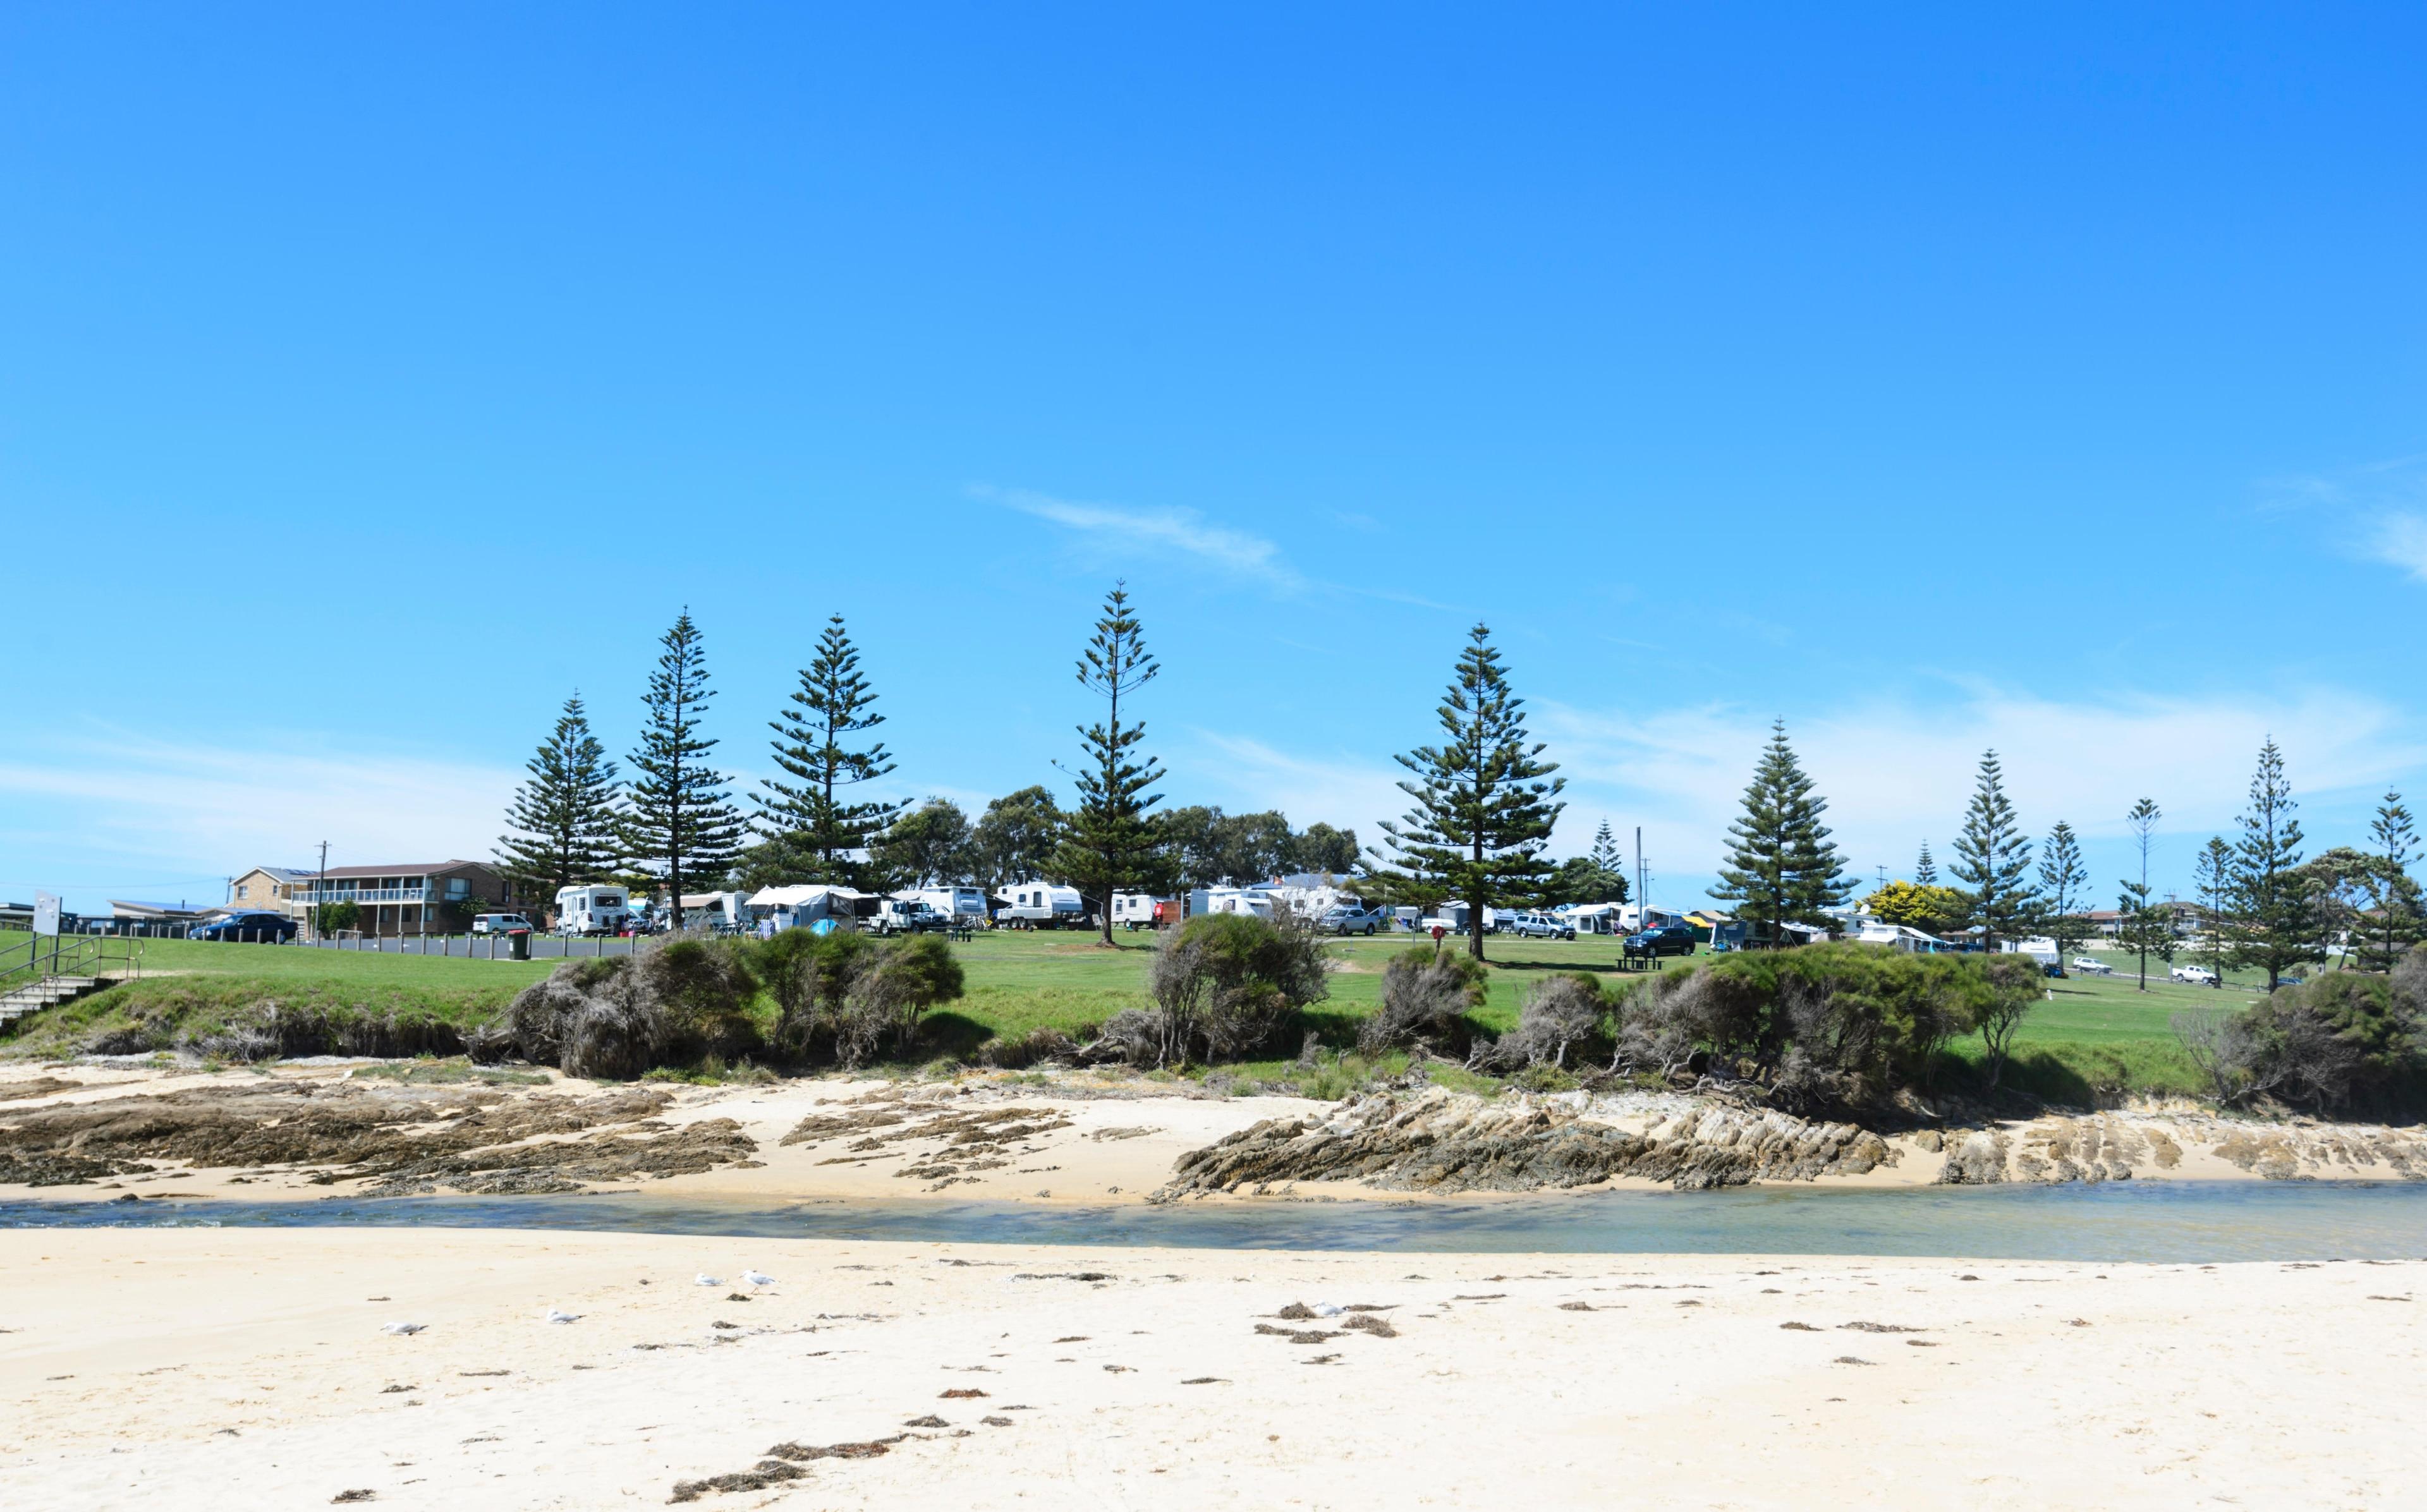 Dalmeny, New South Wales, Australien